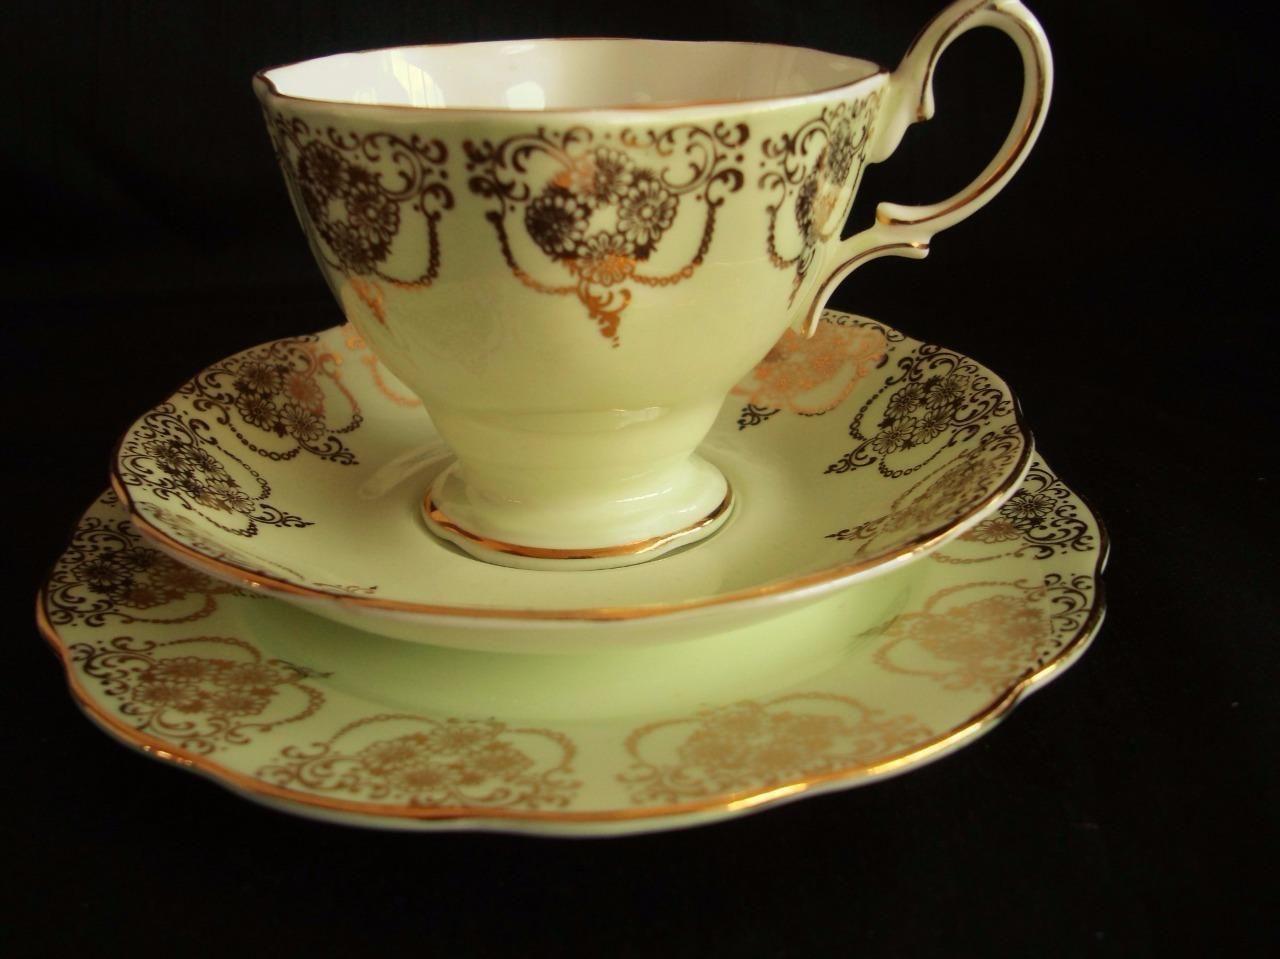 Royal albert bone china tea cup amp saucer winsome pattern ebay - Vintage 1960s Royal Albert Bone China Green Gold Lace Trio Cup Saucer Plate